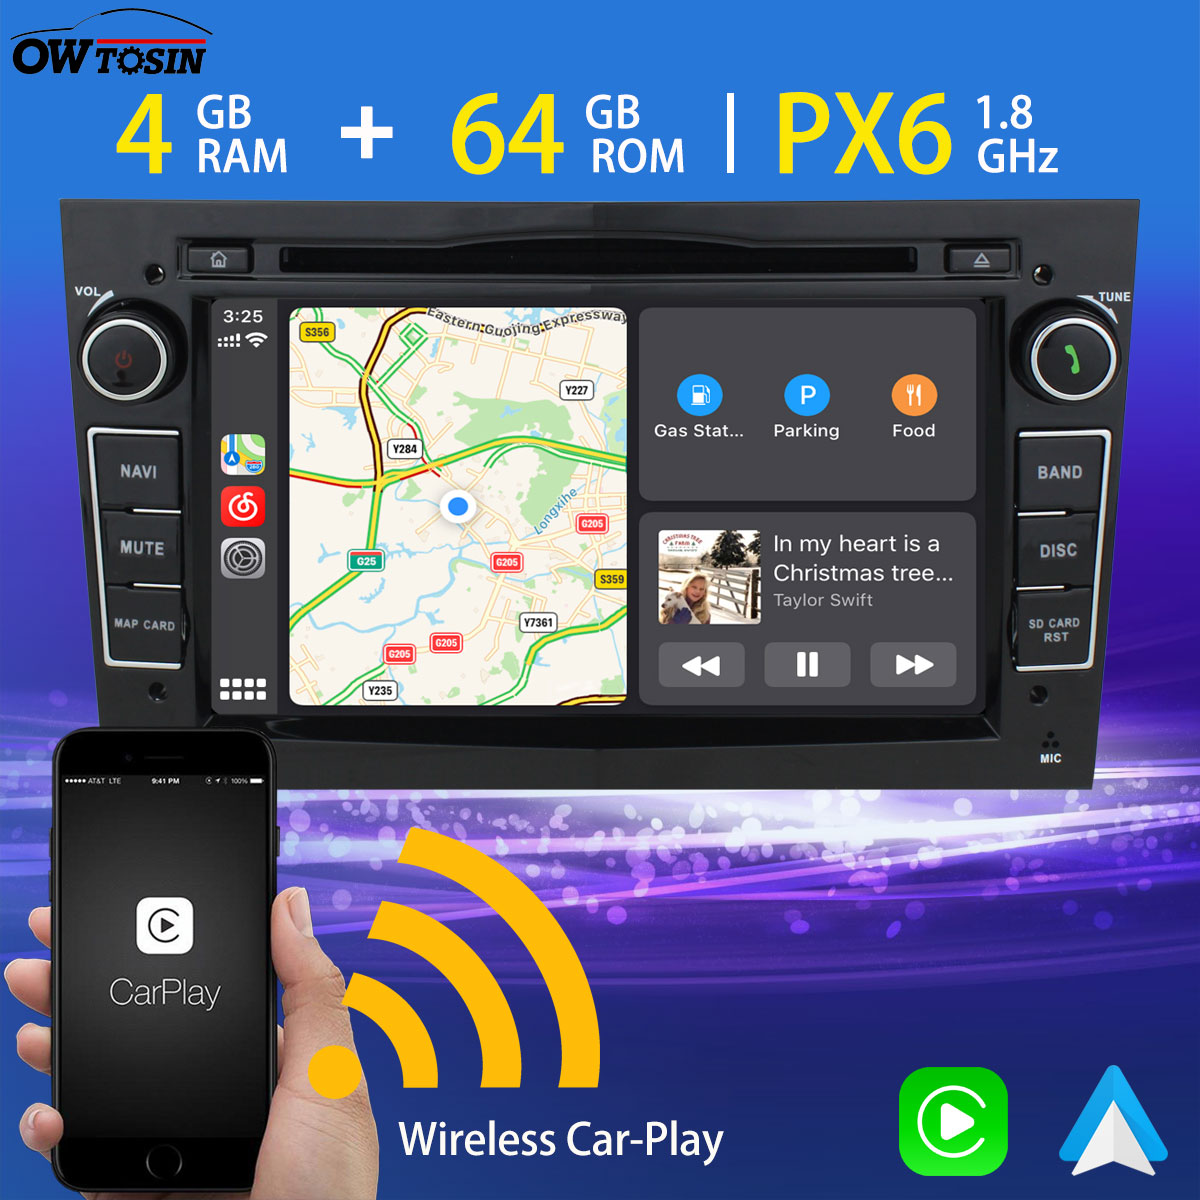 Reproductor Multimedia para coche PX6, 4G + 64G, con Android, GPS, Navi, Radio para Opel Vivaro, Meriva, Vectra, C, Zafira, B, Insignia, Combo Signum Stereo